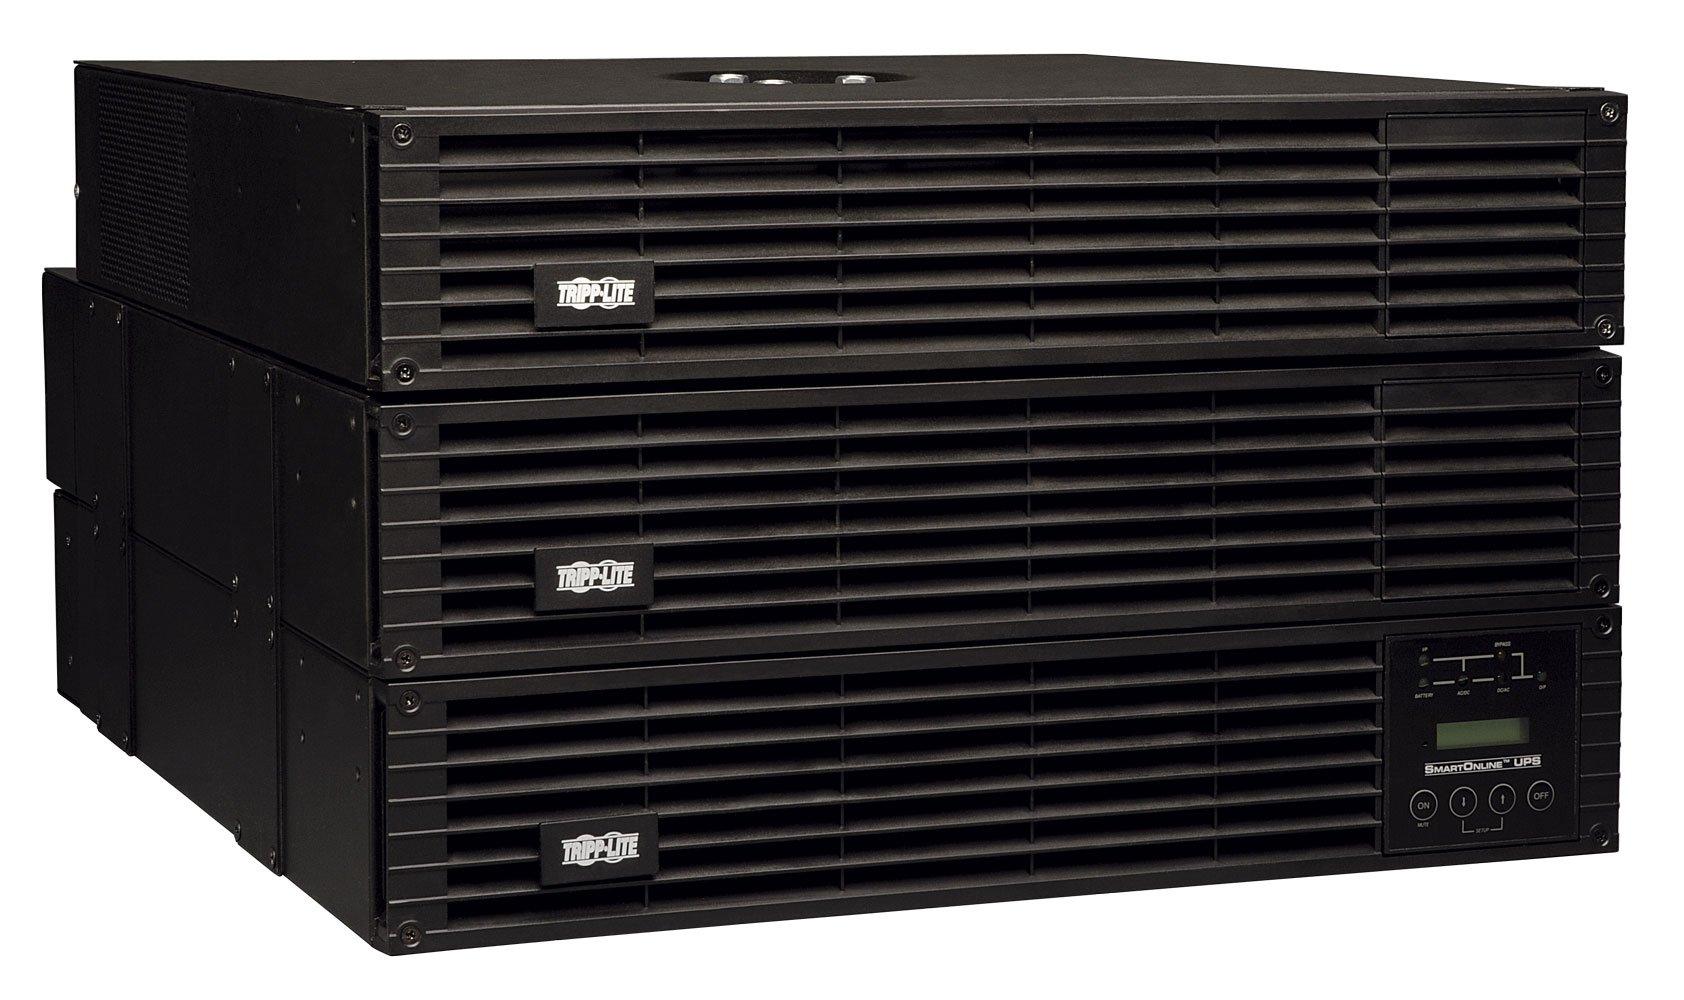 Tripp Lite SU6000RT4UTF 6000VA 5400W UPS Smart Online Rackmount 6kVA PDU 208/240/120V 6U, 16 Outlets